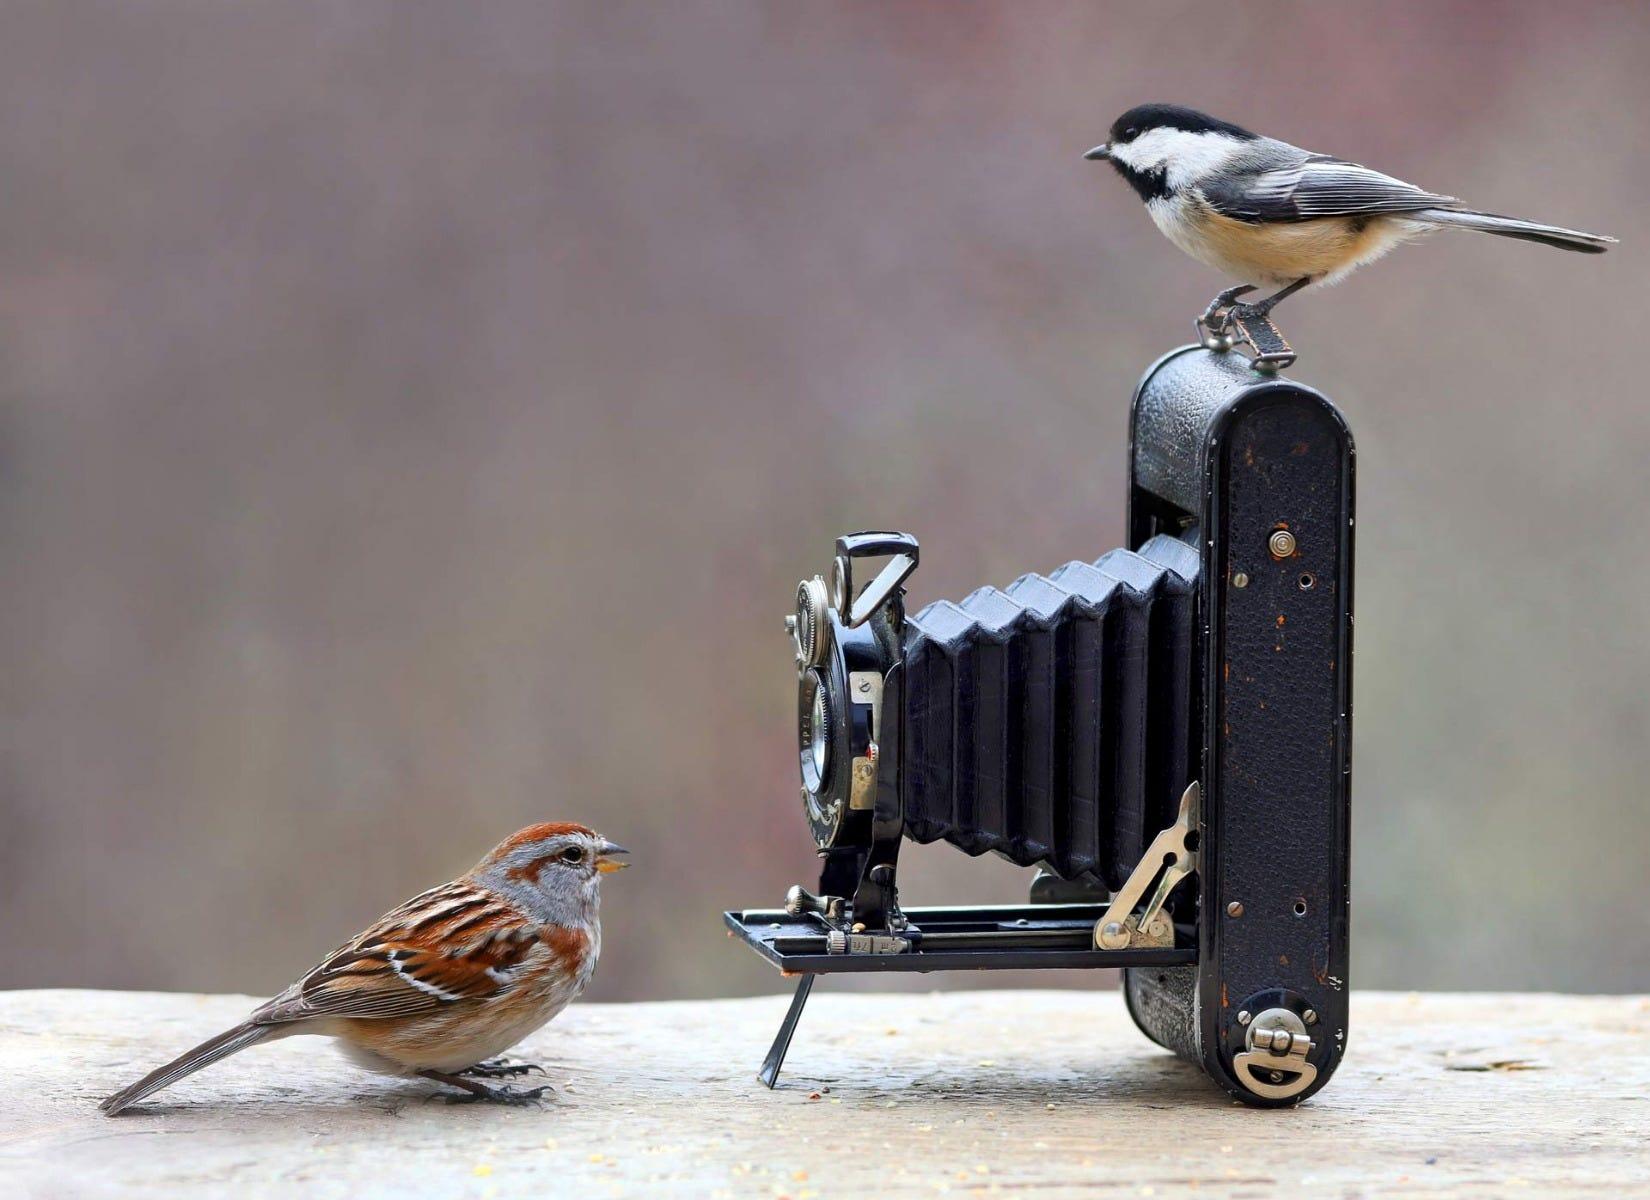 birds on antique camera